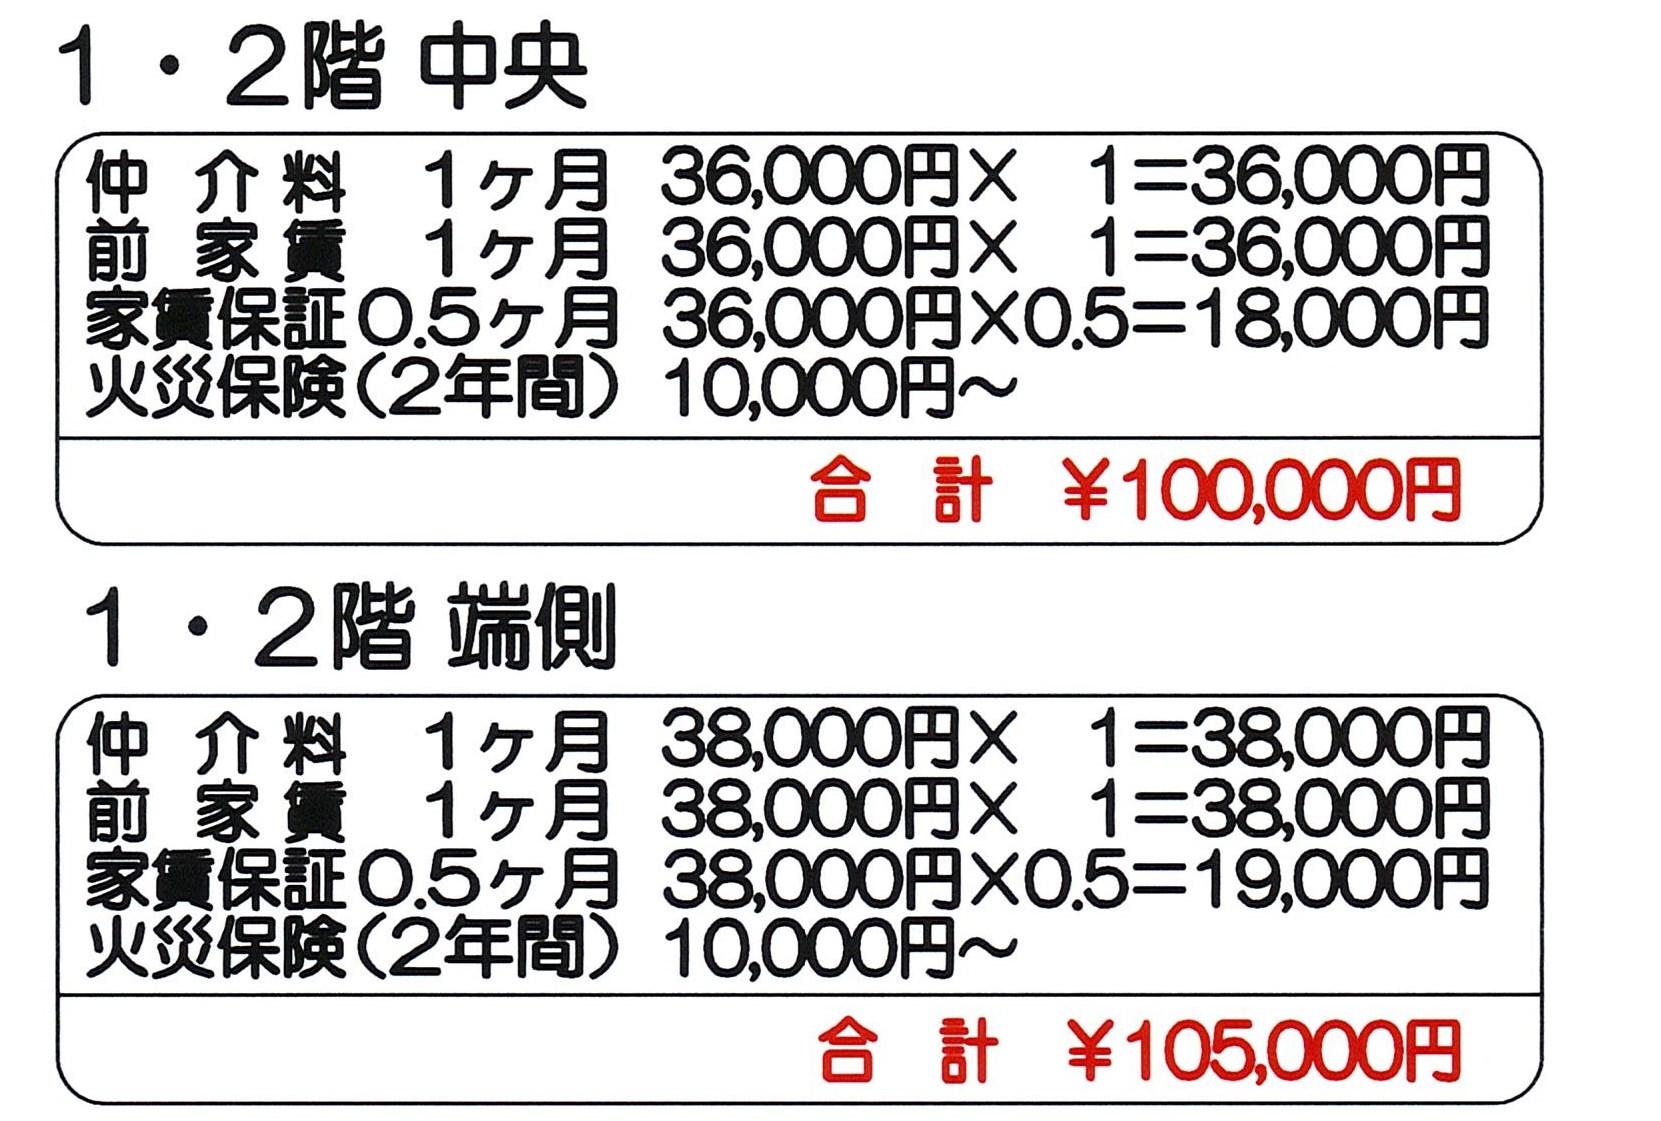 https://life-kawaminami.jp/wp-content/uploads/2021/06/fcf1d08217b6d7ab3751cac91545898f.jpg